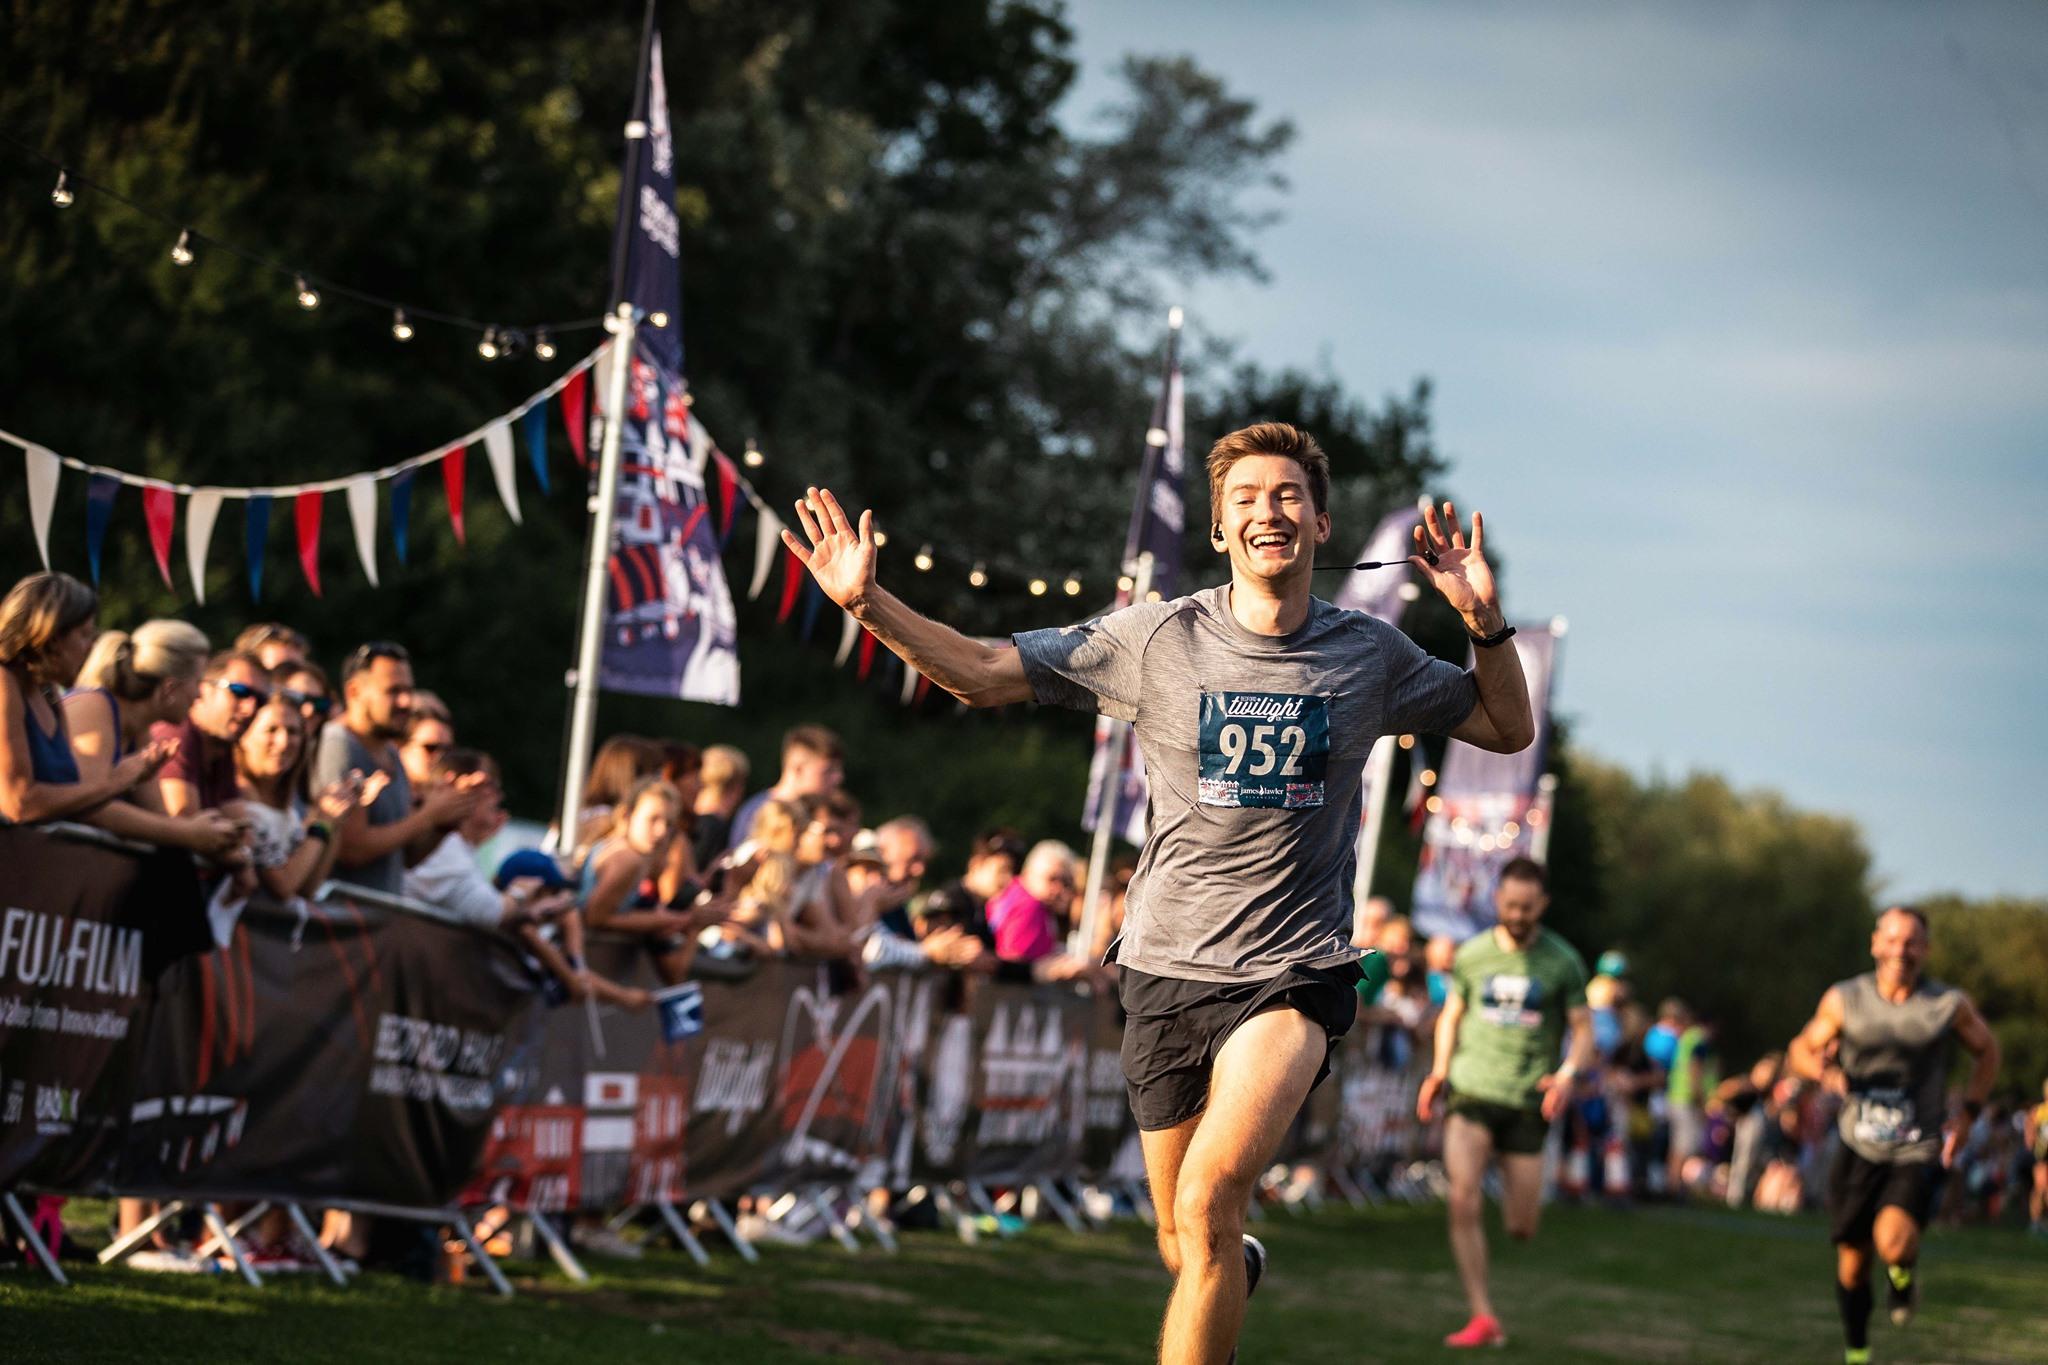 Bedford Spring Half Marathon - cover image